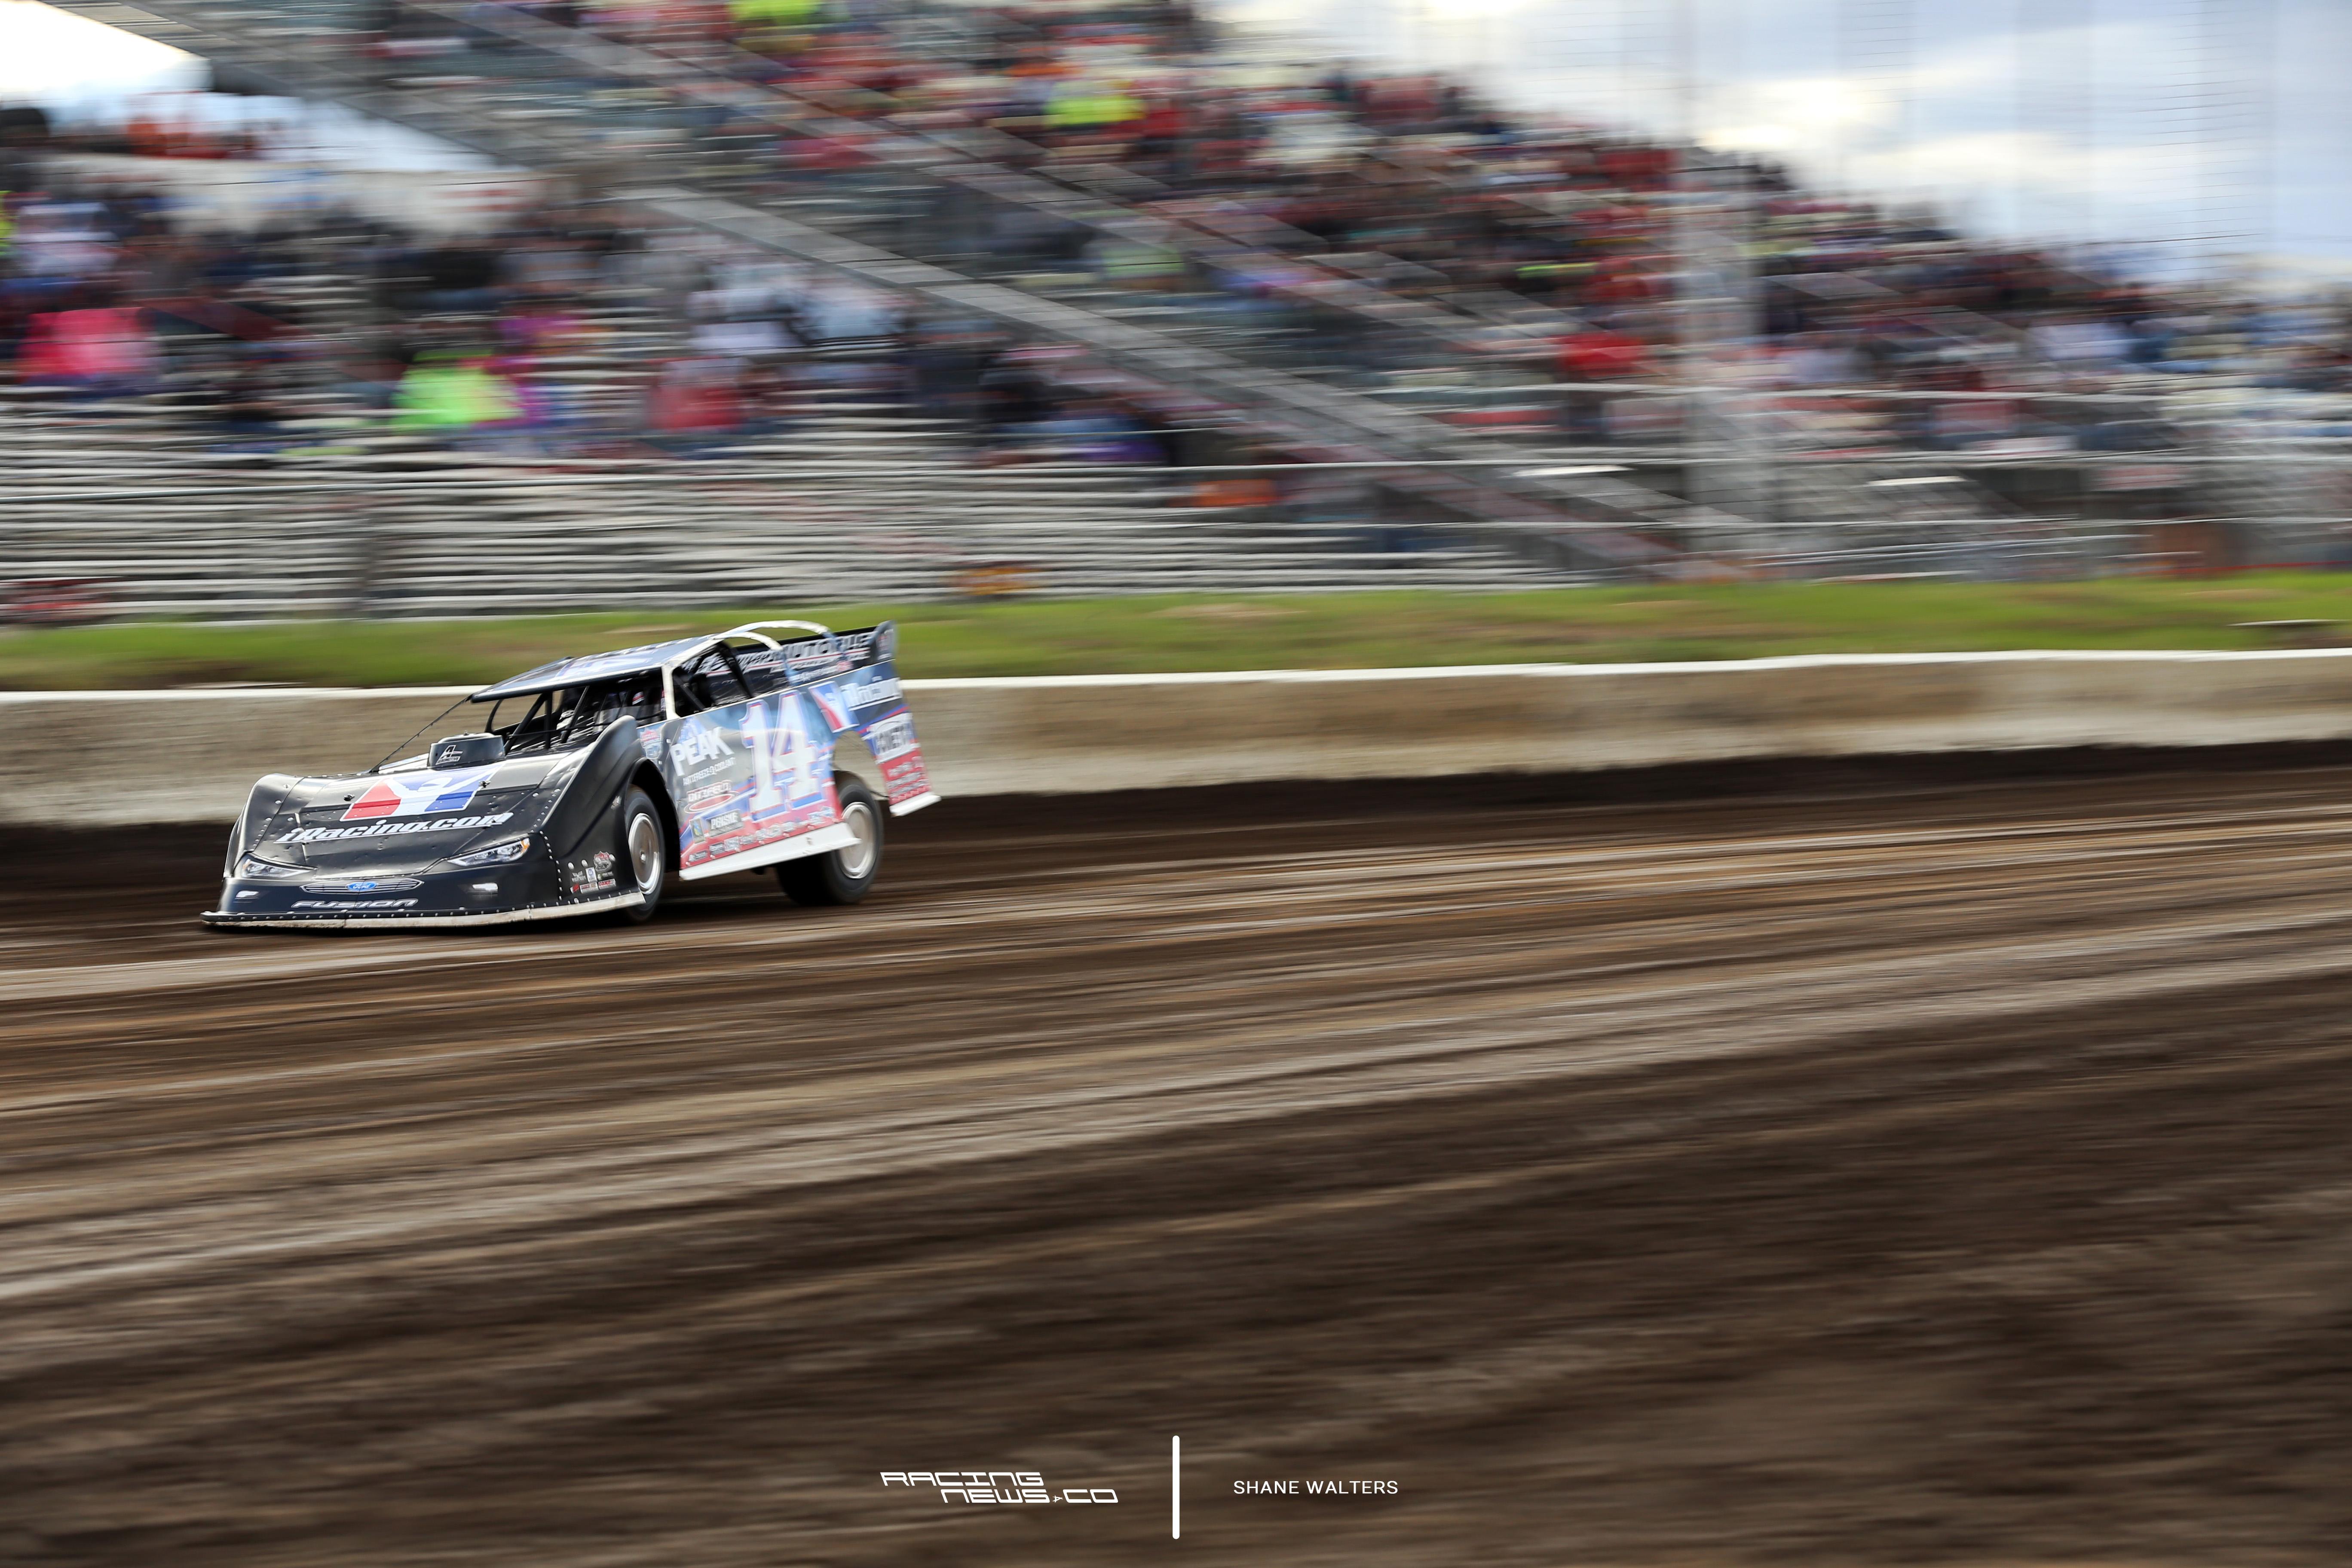 Darrell Lanigan Lucas Oil Dirt Series Photos 7653